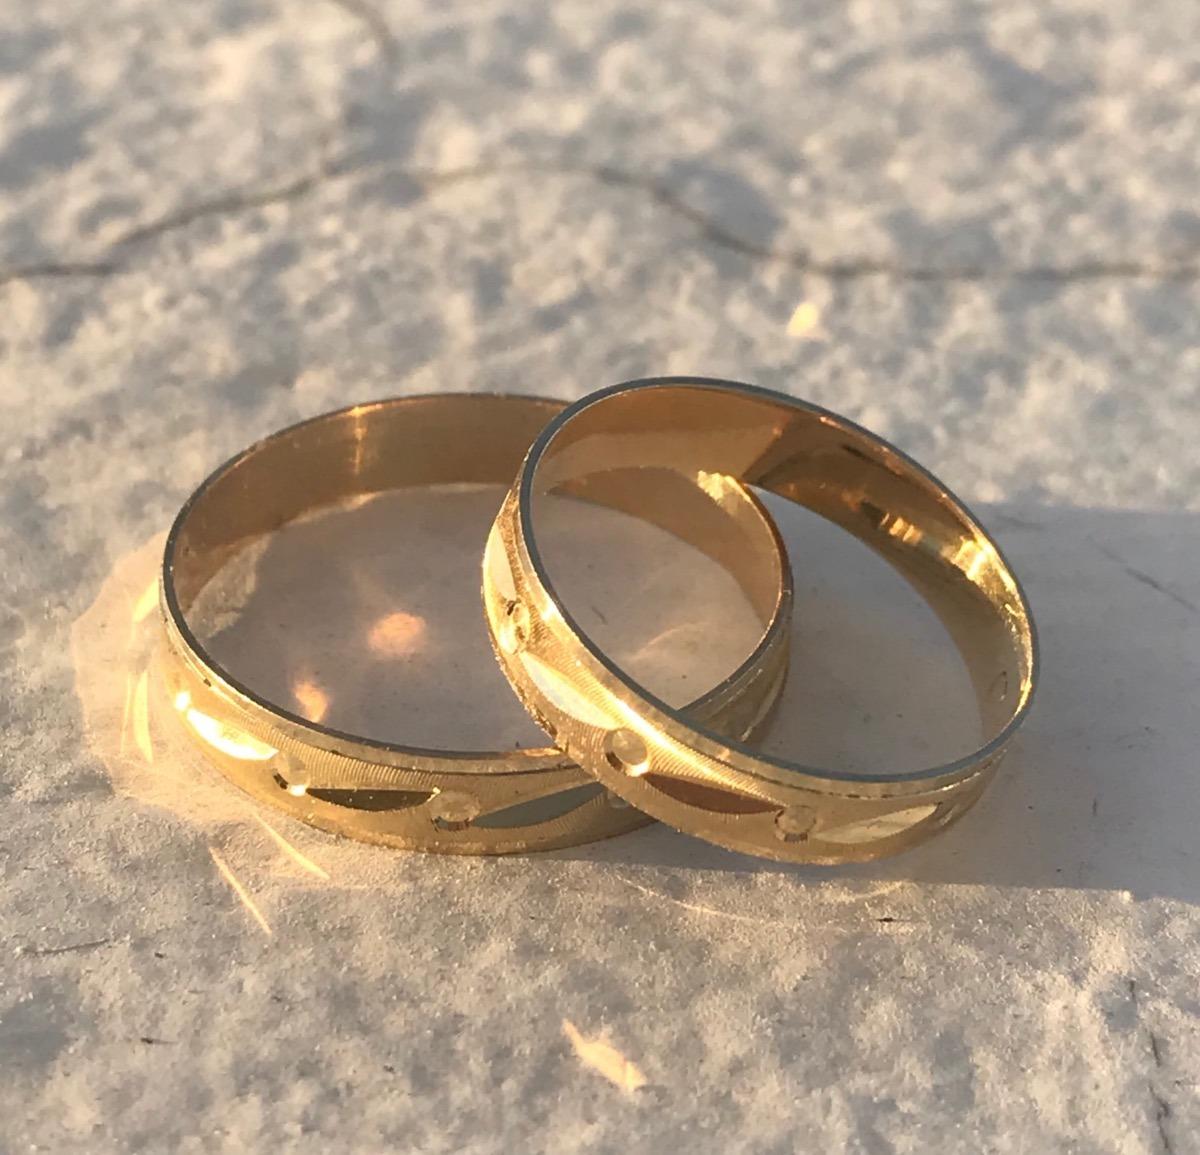 bbec5e41f9ce3 anillos par argollas matrimonio boda oro 10 kilates. Cargando zoom.